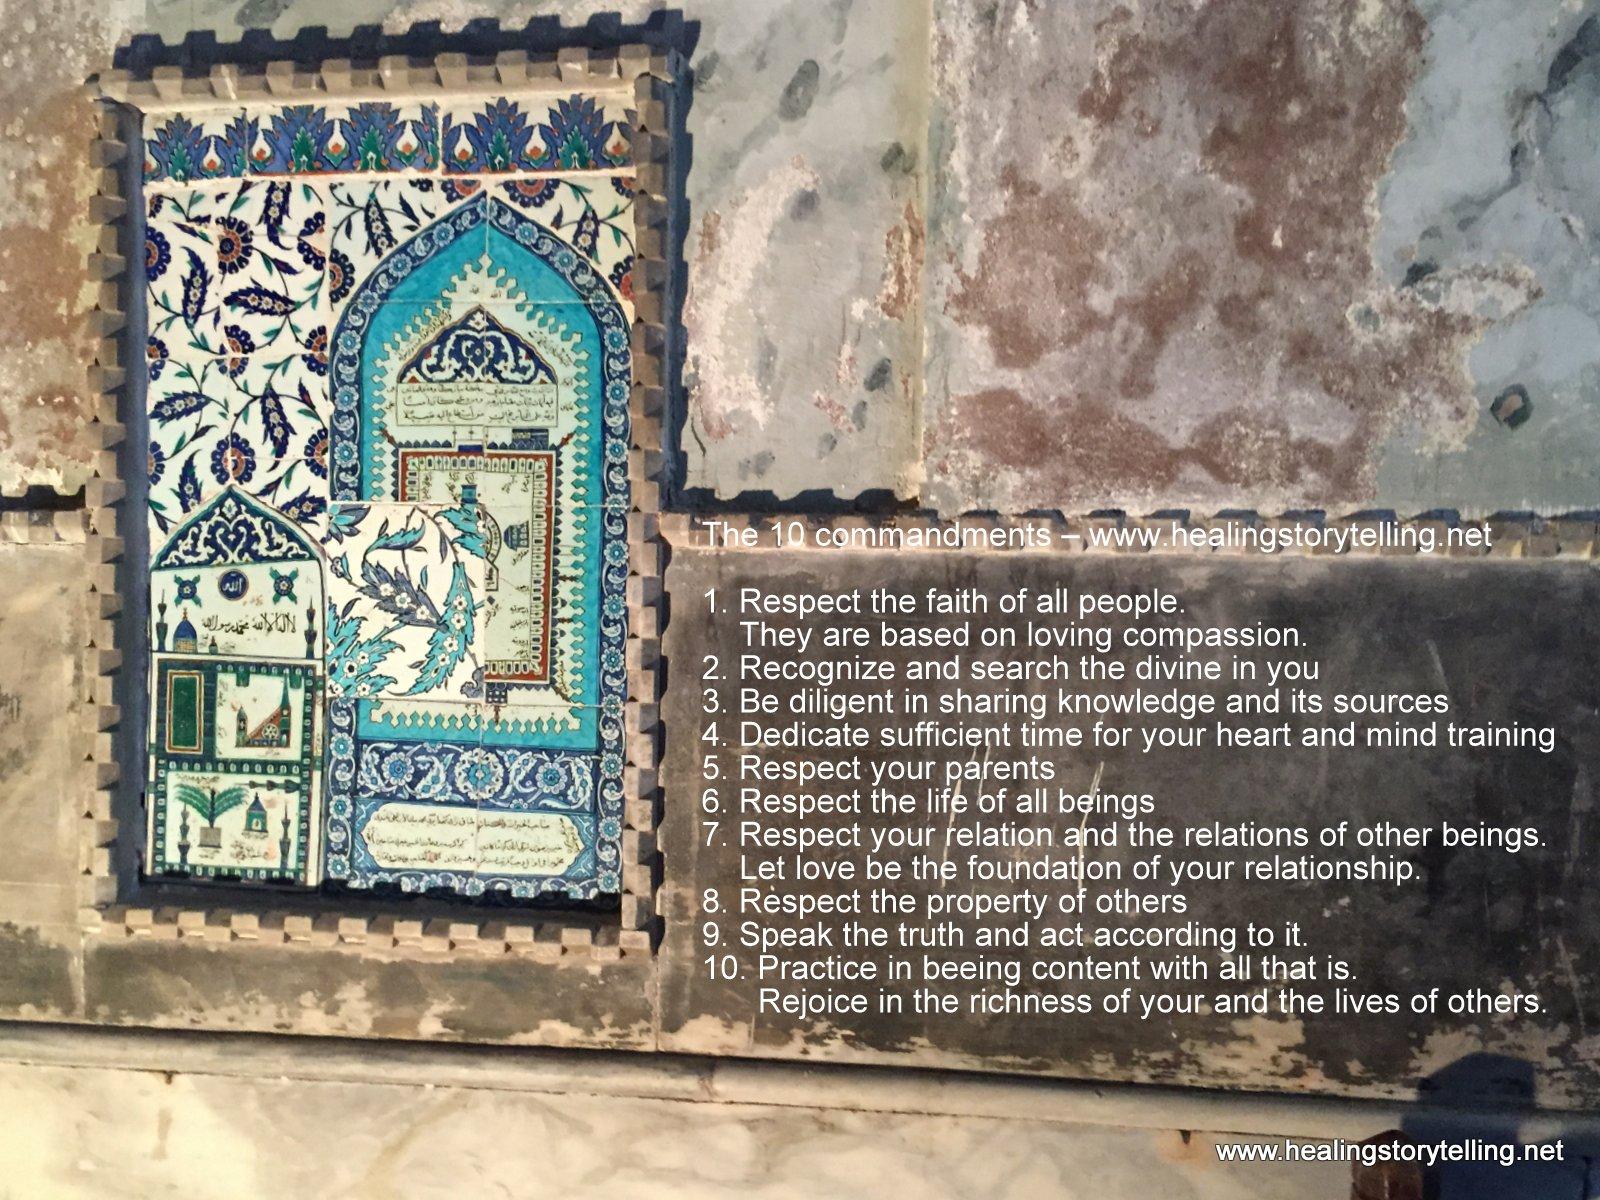 Remix of the 10 commandments